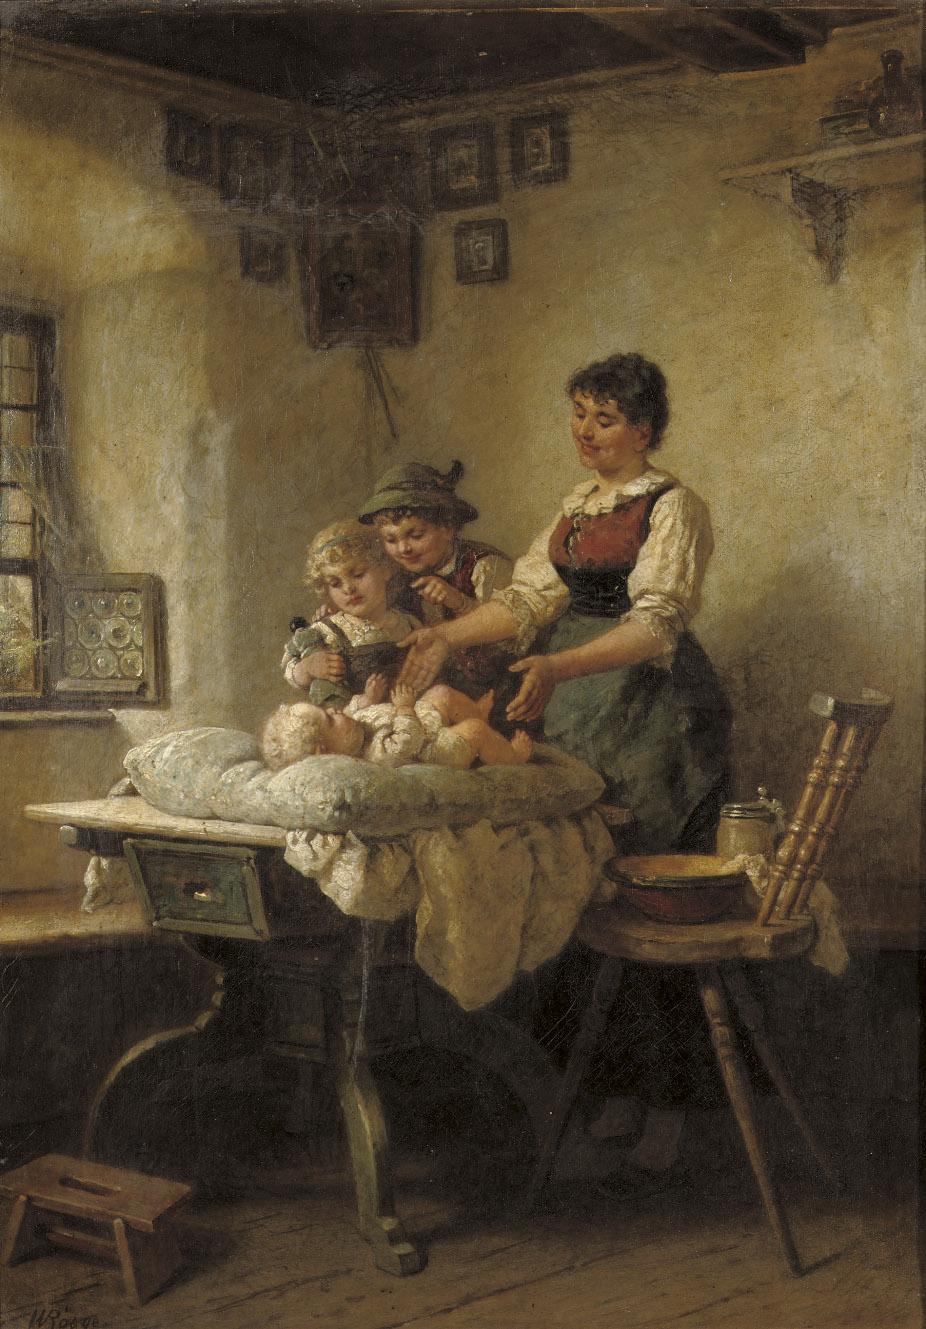 Admiring the newborn